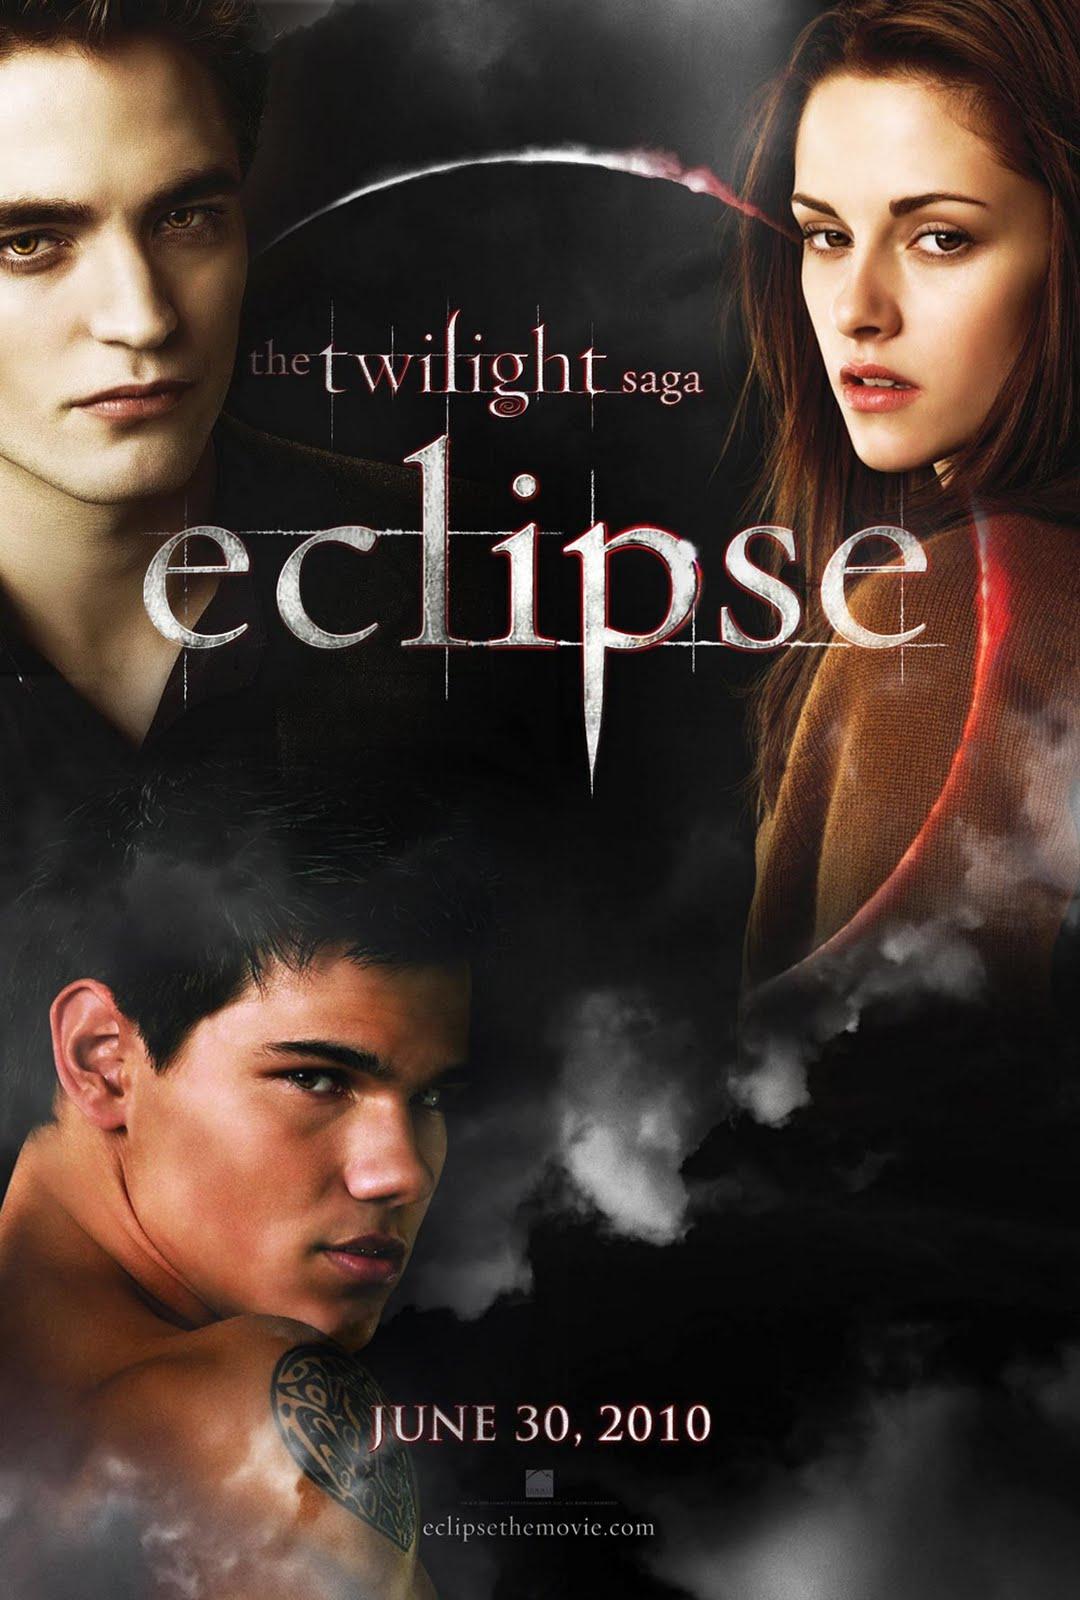 Eclipse Twilight